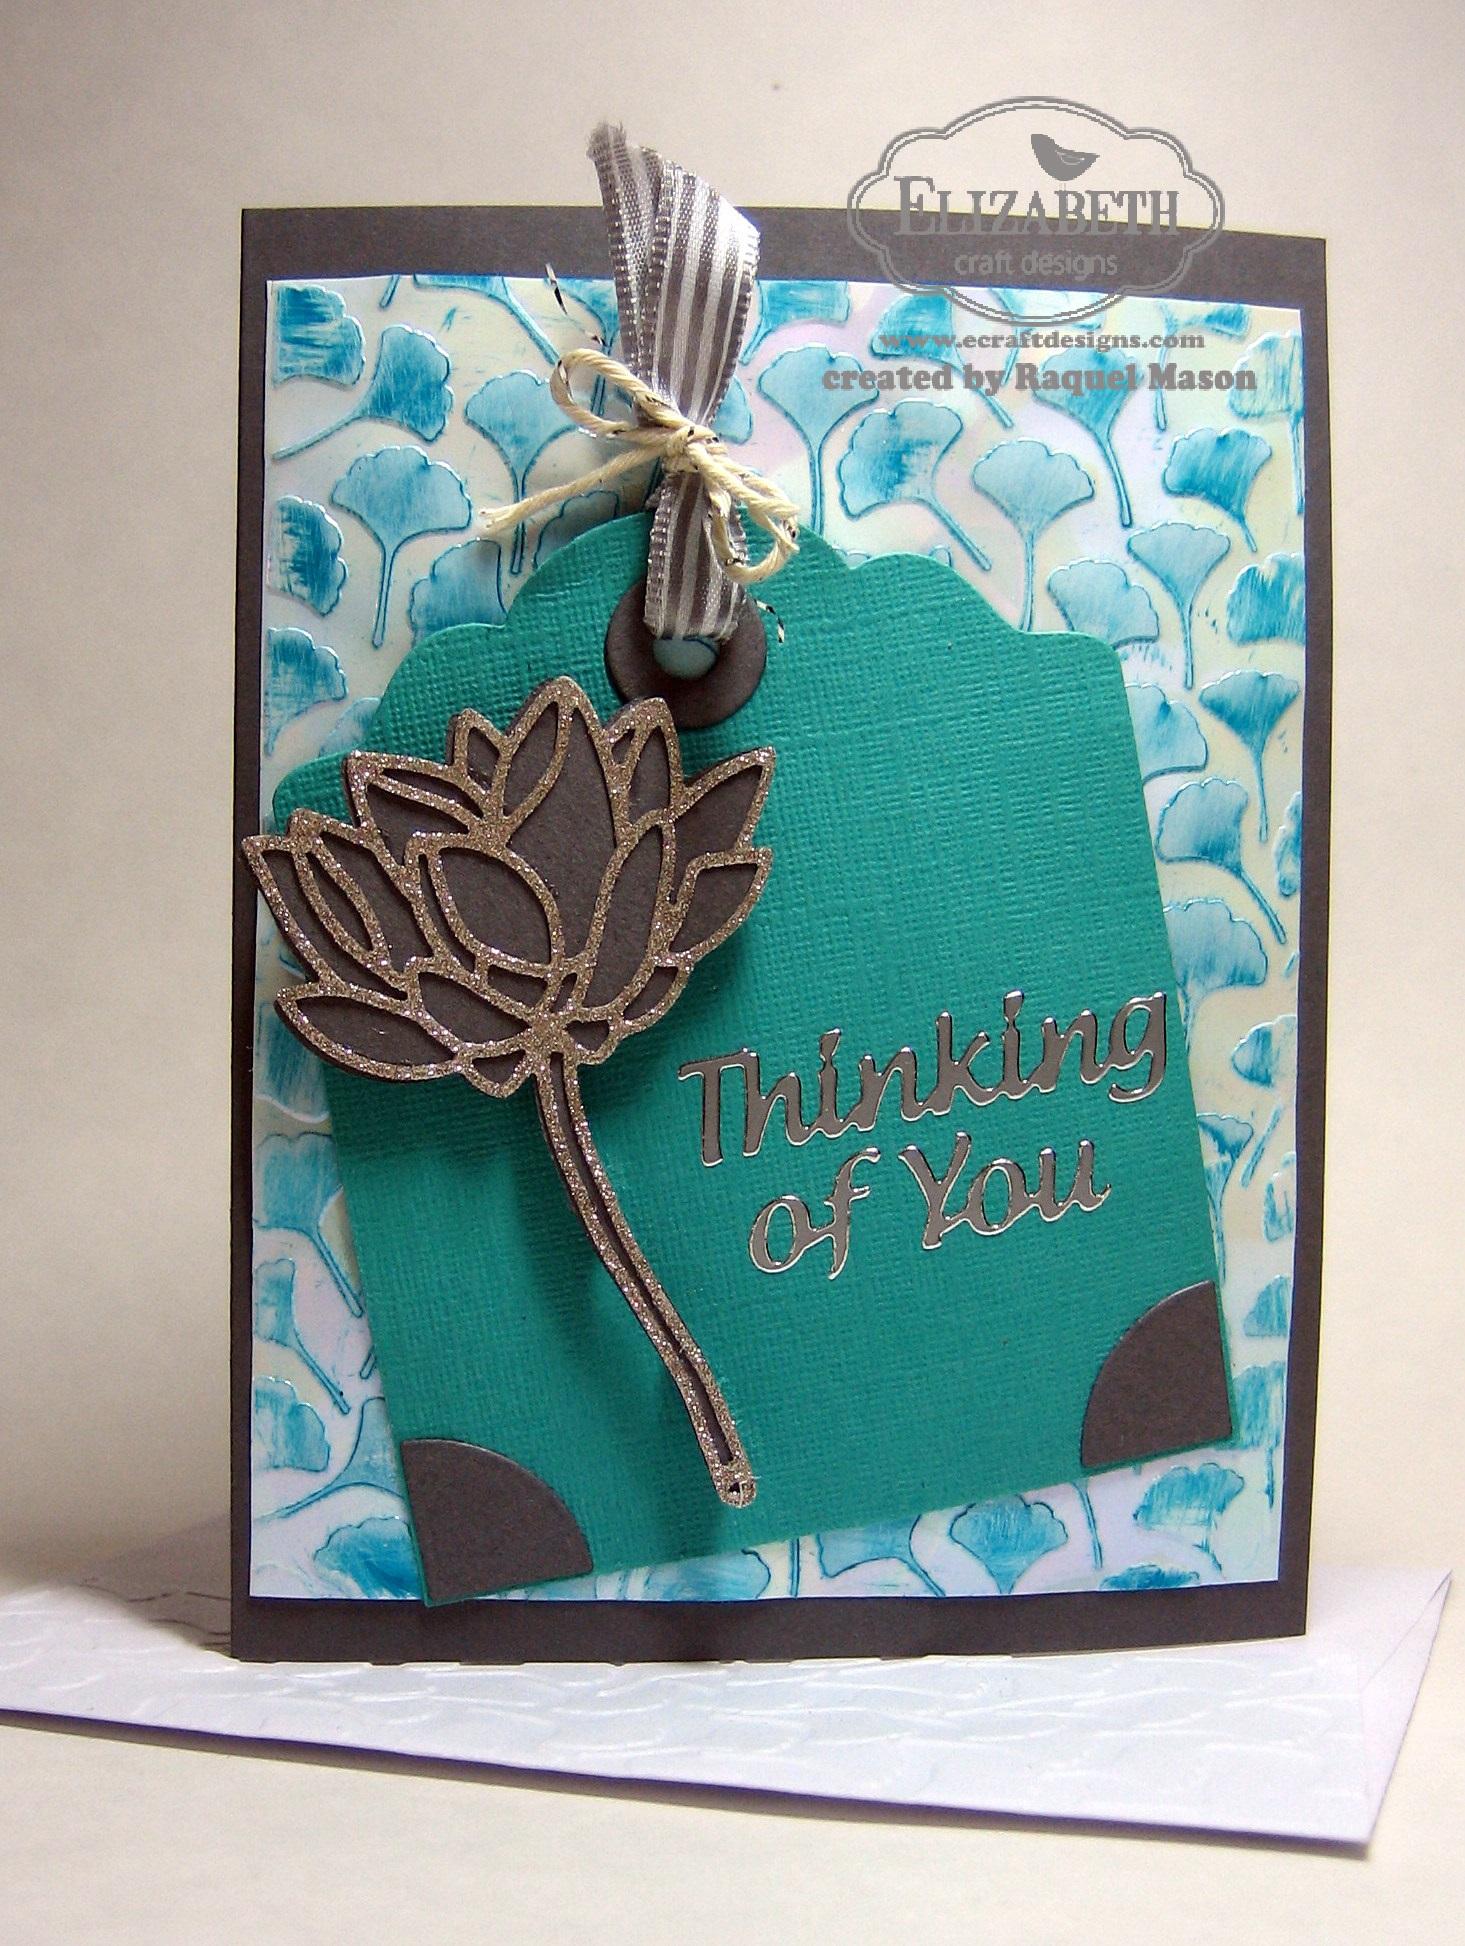 Glitter lotus flower for Elizabeth craft designs glitter